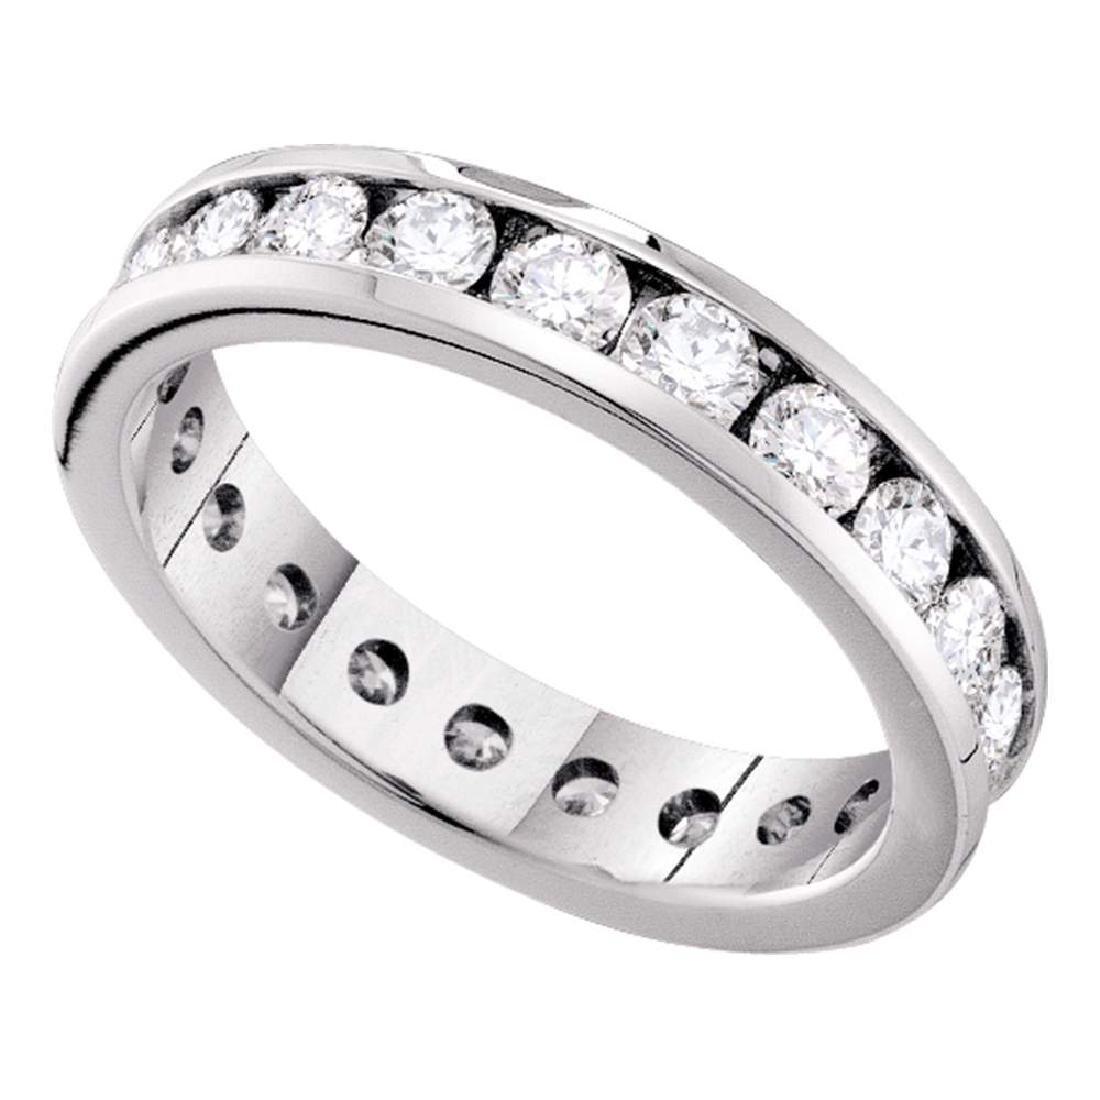 1 CTW Diamond Eternity Wedding Anniversary Ring 14KT